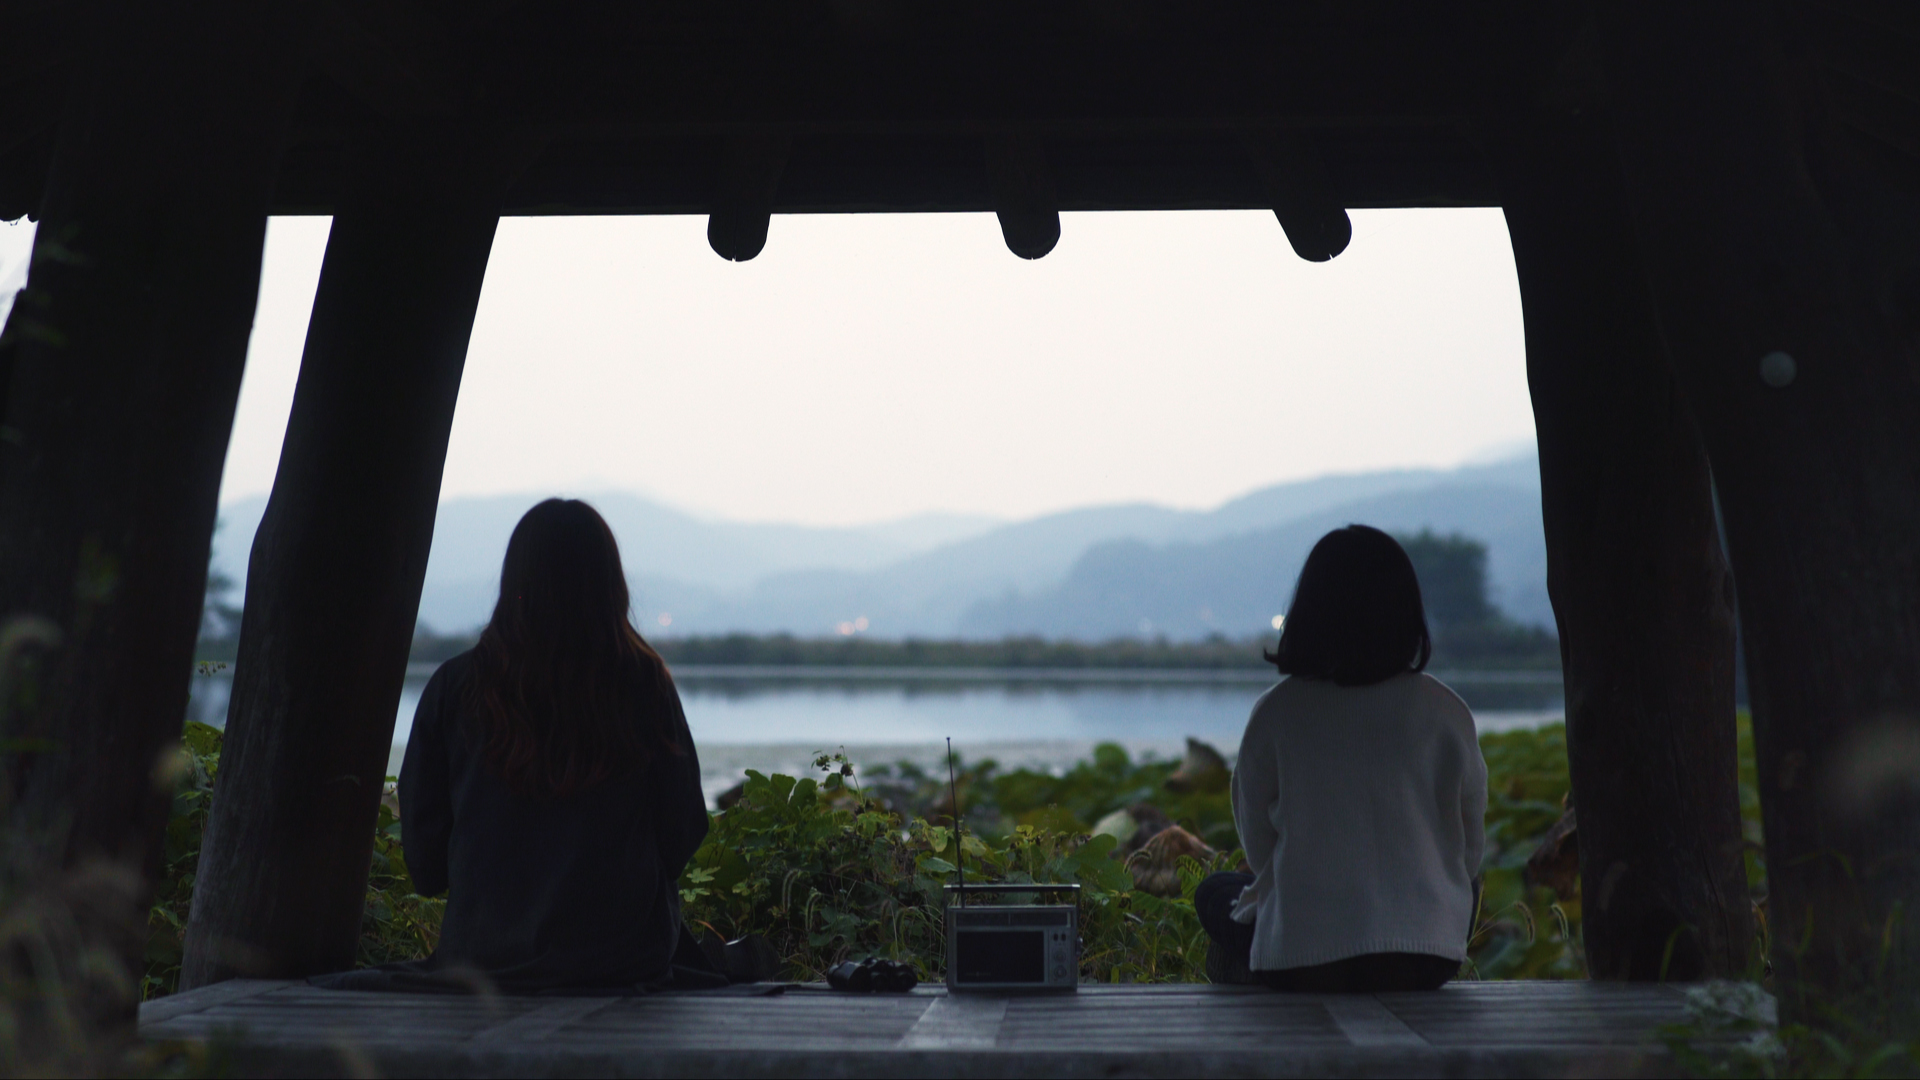 heeyeon yeowoon sitting by water.jpg